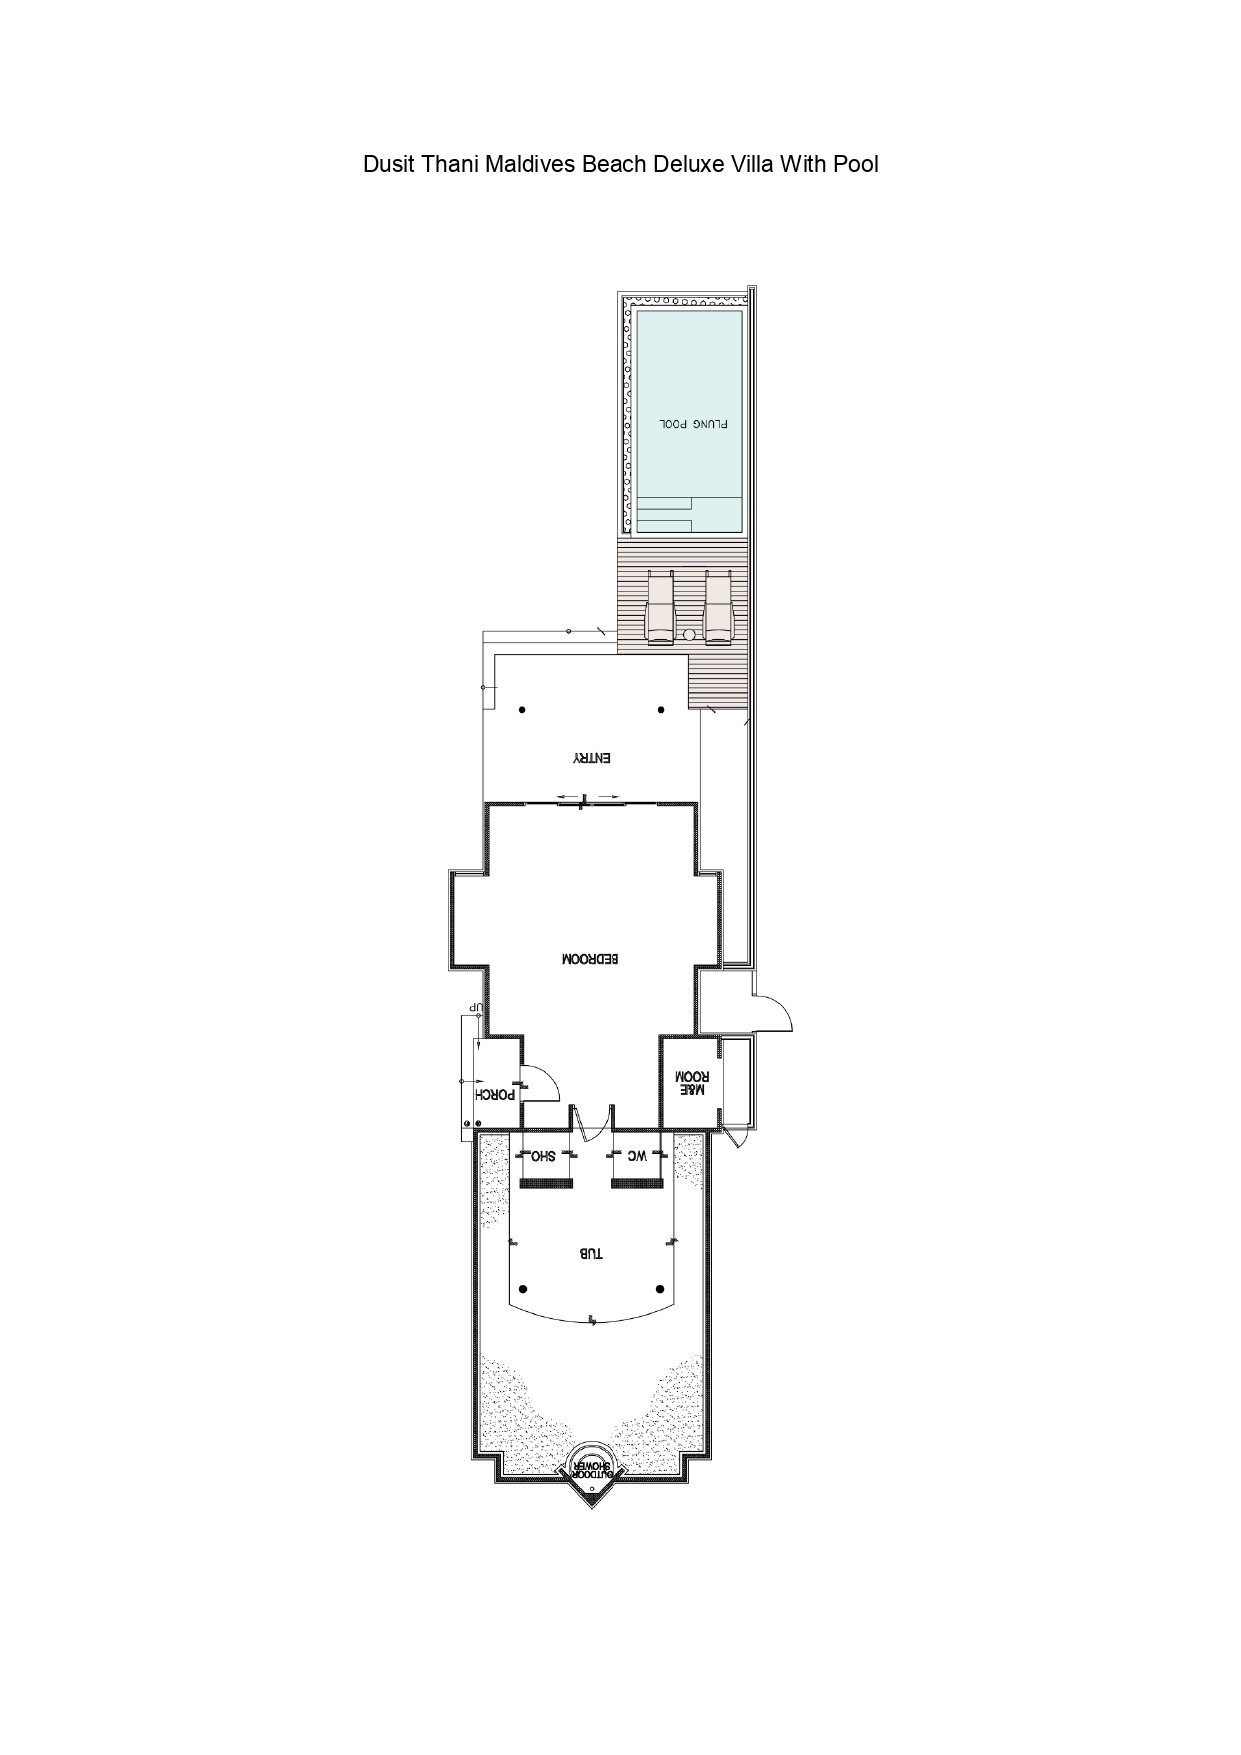 Мальдивы, отель Dusit Thani Maldives, план-схема номера Deluxe Beach Villa with Pool